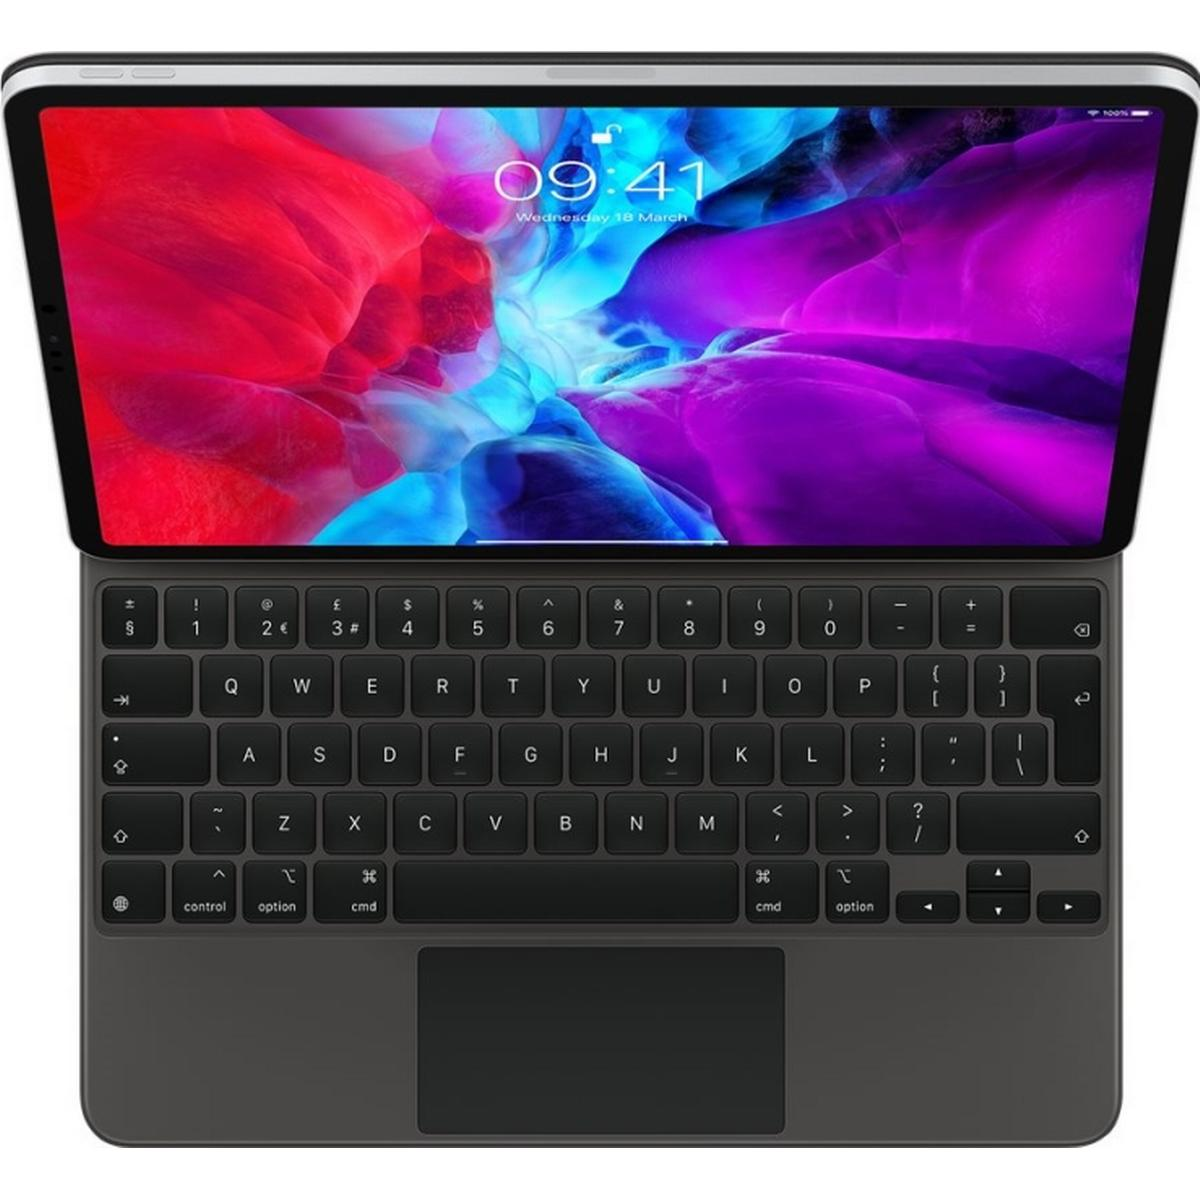 Ipad air bluetooth keyboard • Find billigste pris hos